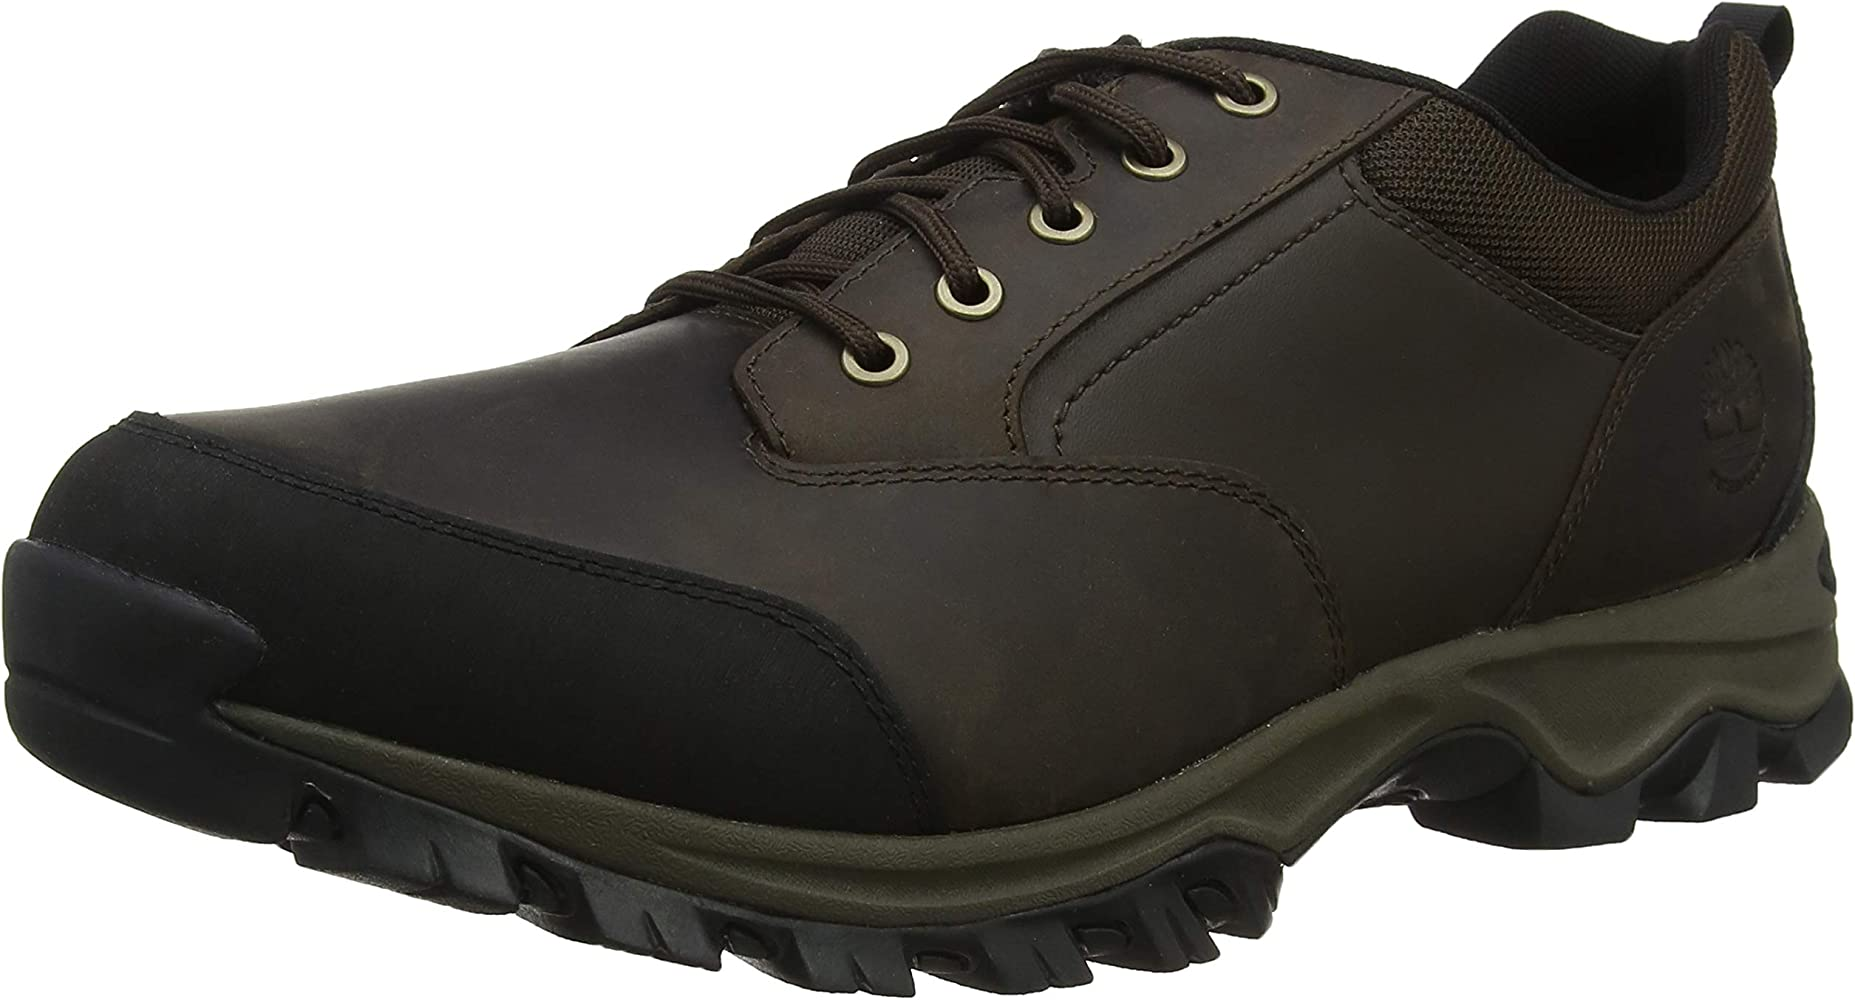 Timberland Keele Ridge Low Oxford Hiking Schuhe Männer